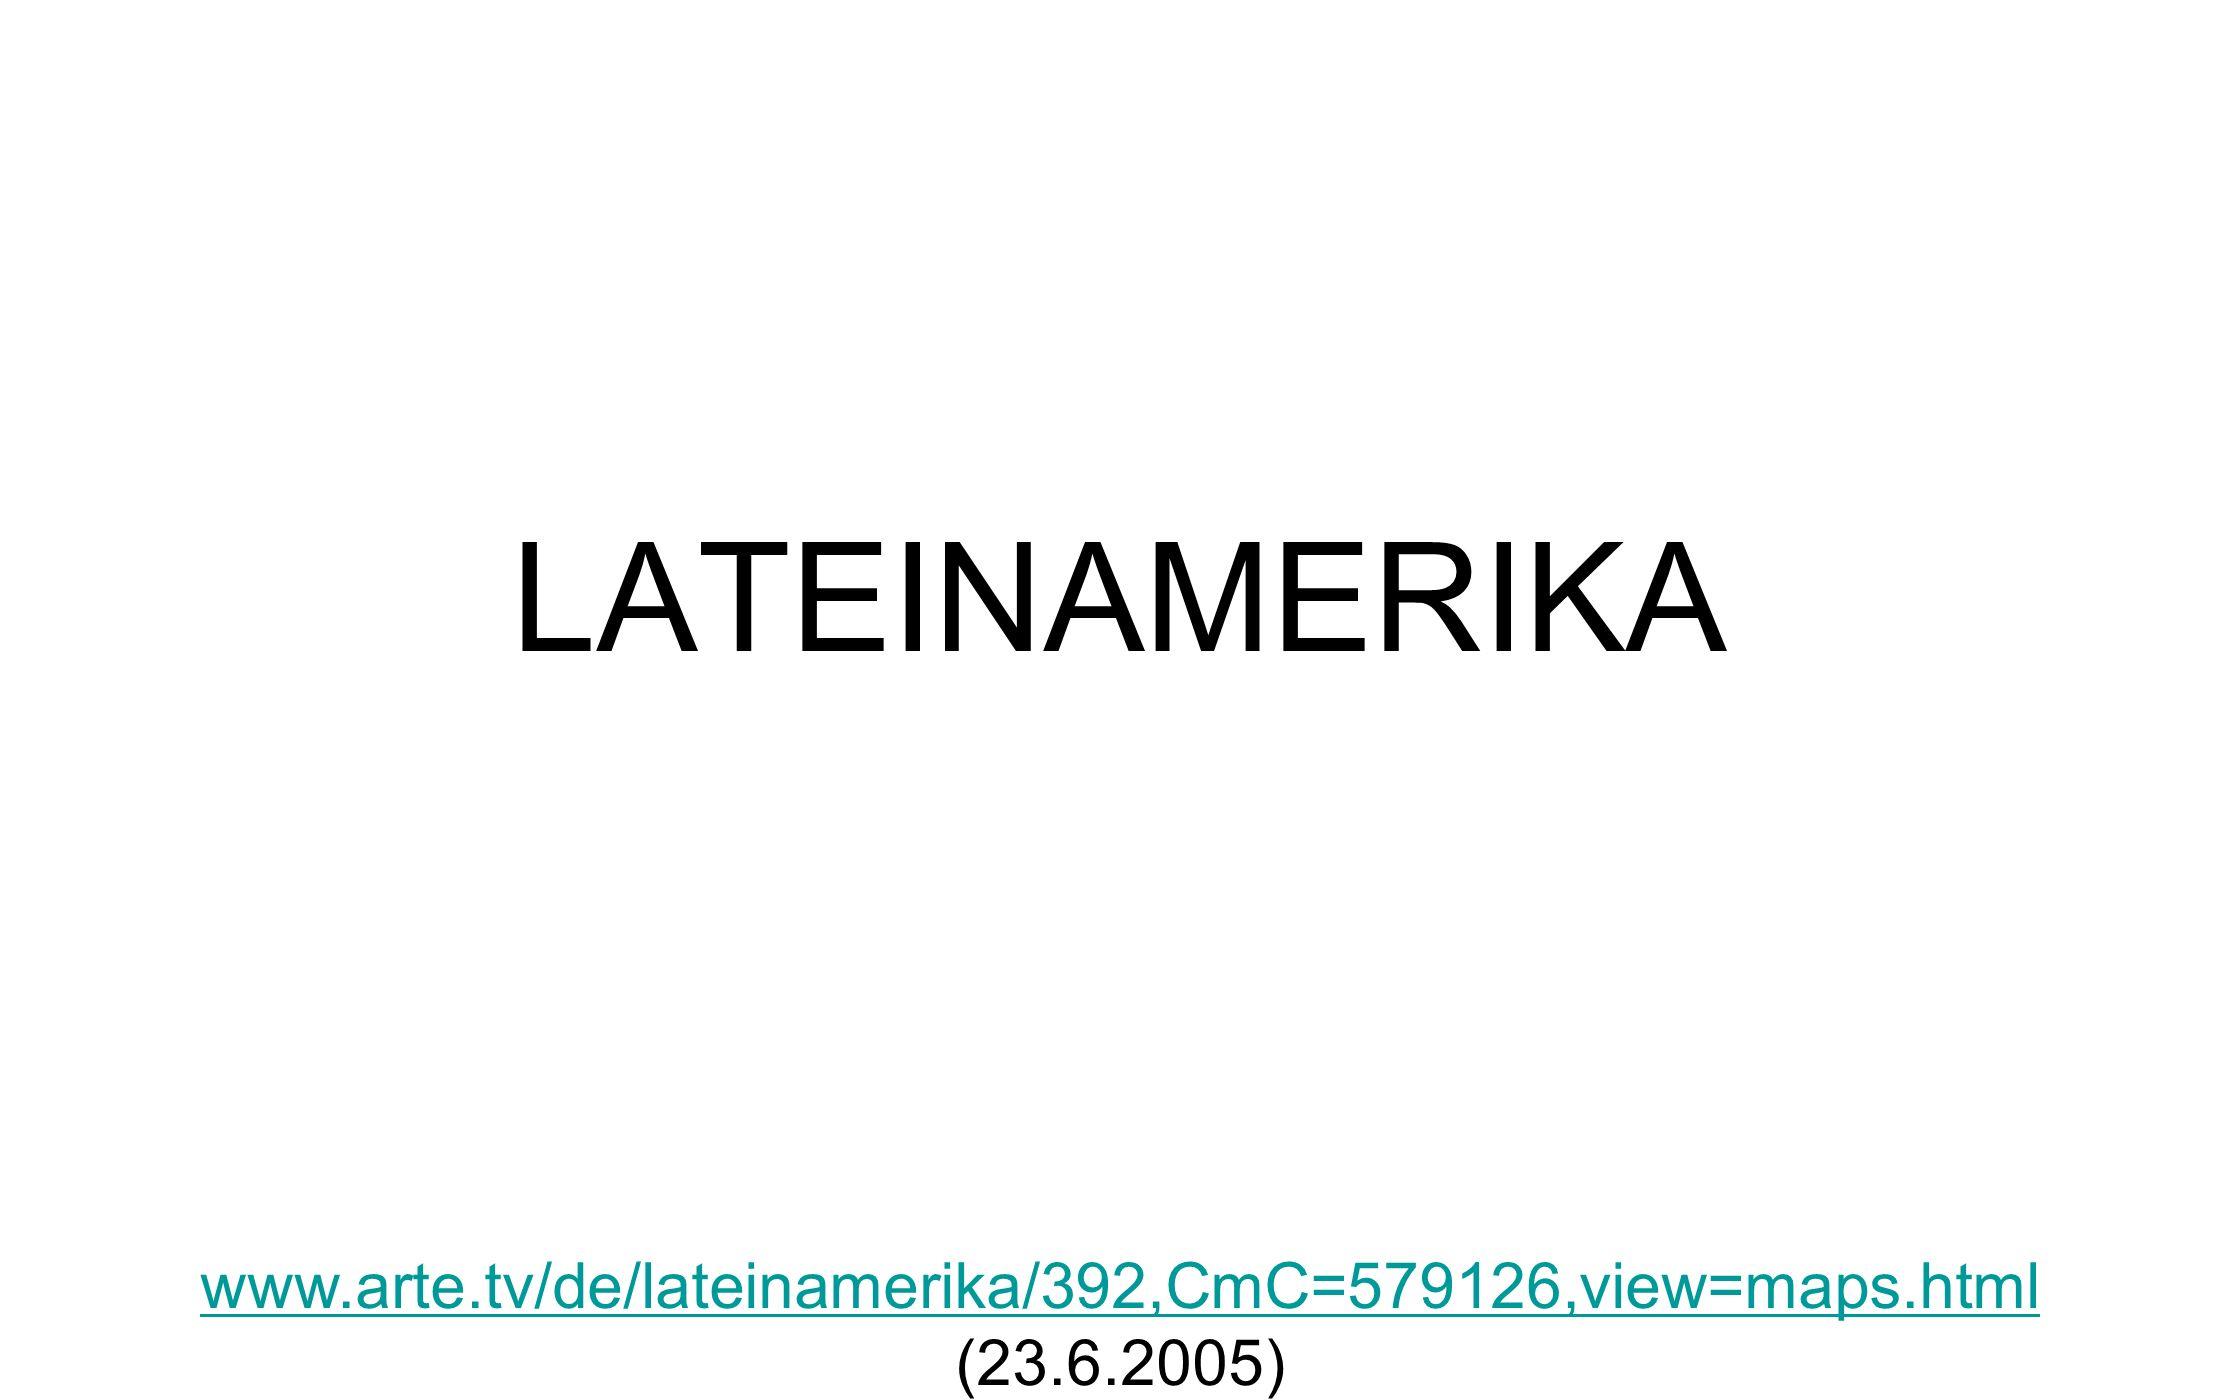 LATEINAMERIKA www.arte.tv/de/lateinamerika/392,CmC=579126,view=maps.html www.arte.tv/de/lateinamerika/392,CmC=579126,view=maps.html (23.6.2005)